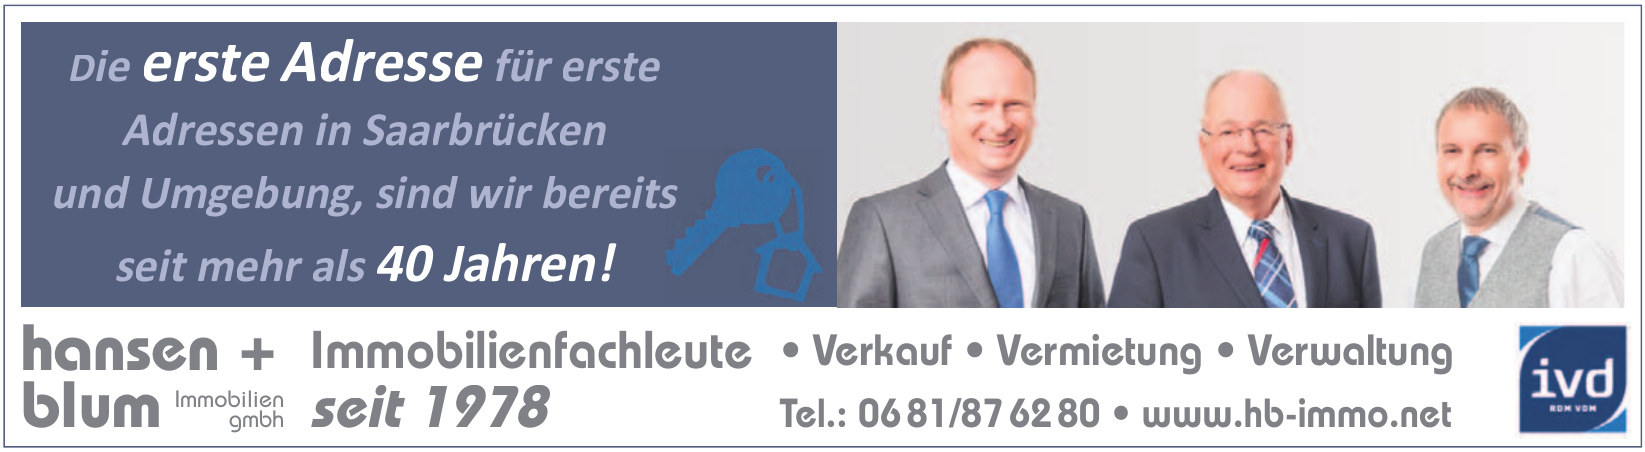 hansen + blum - immobilien GmbH